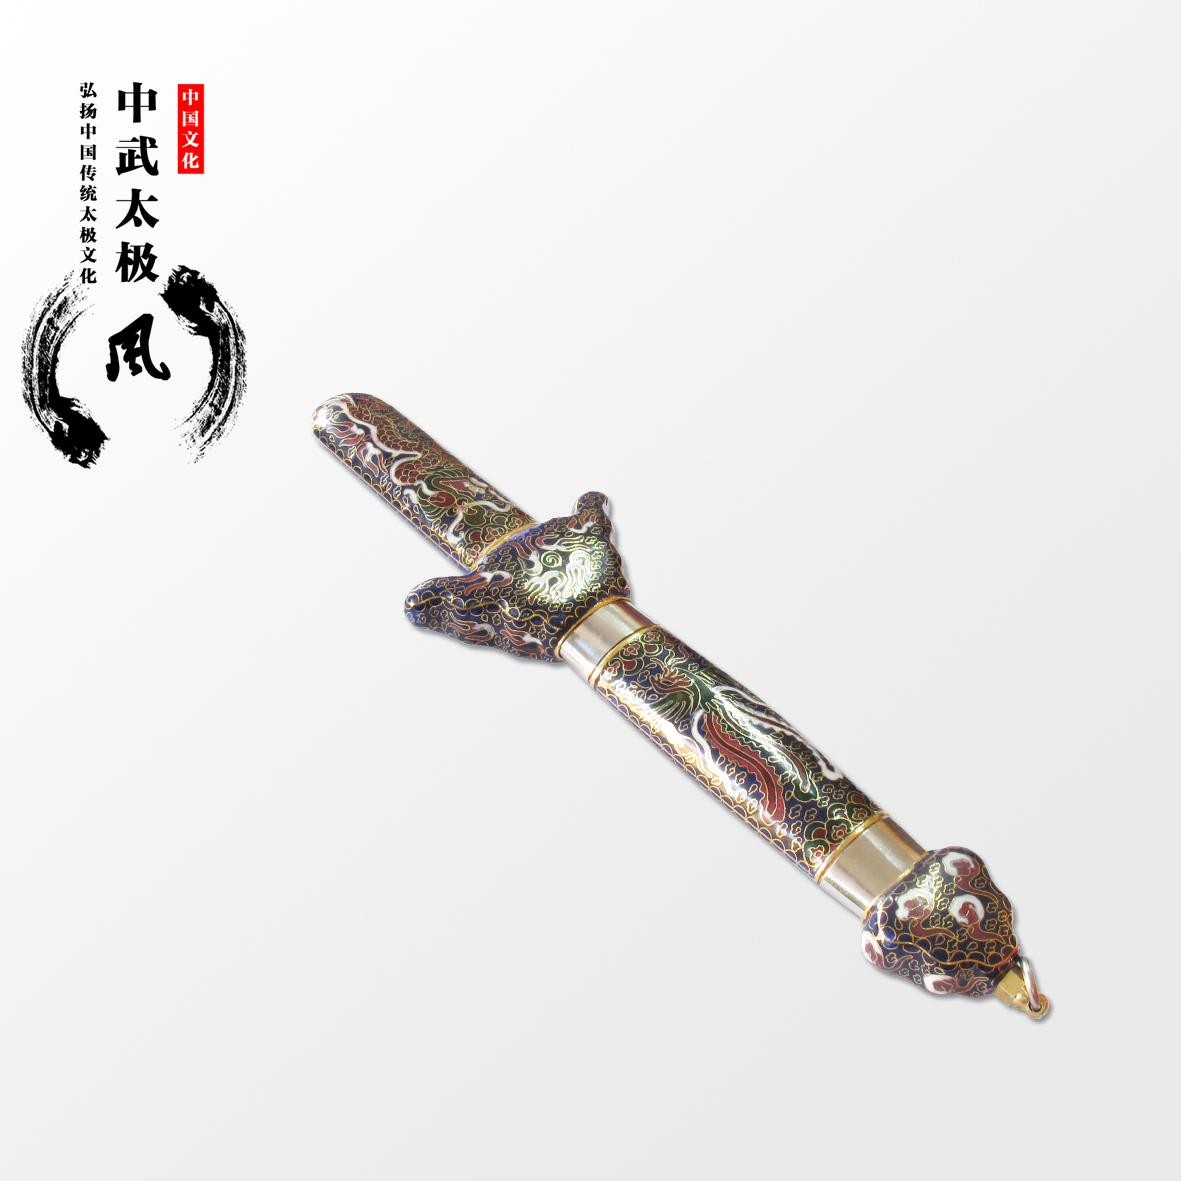 Beijing Wuhan high-grade stainless steel telescopic Cloisonne sword Taiji sword sword sword sword ear send morning show<br><br>Aliexpress